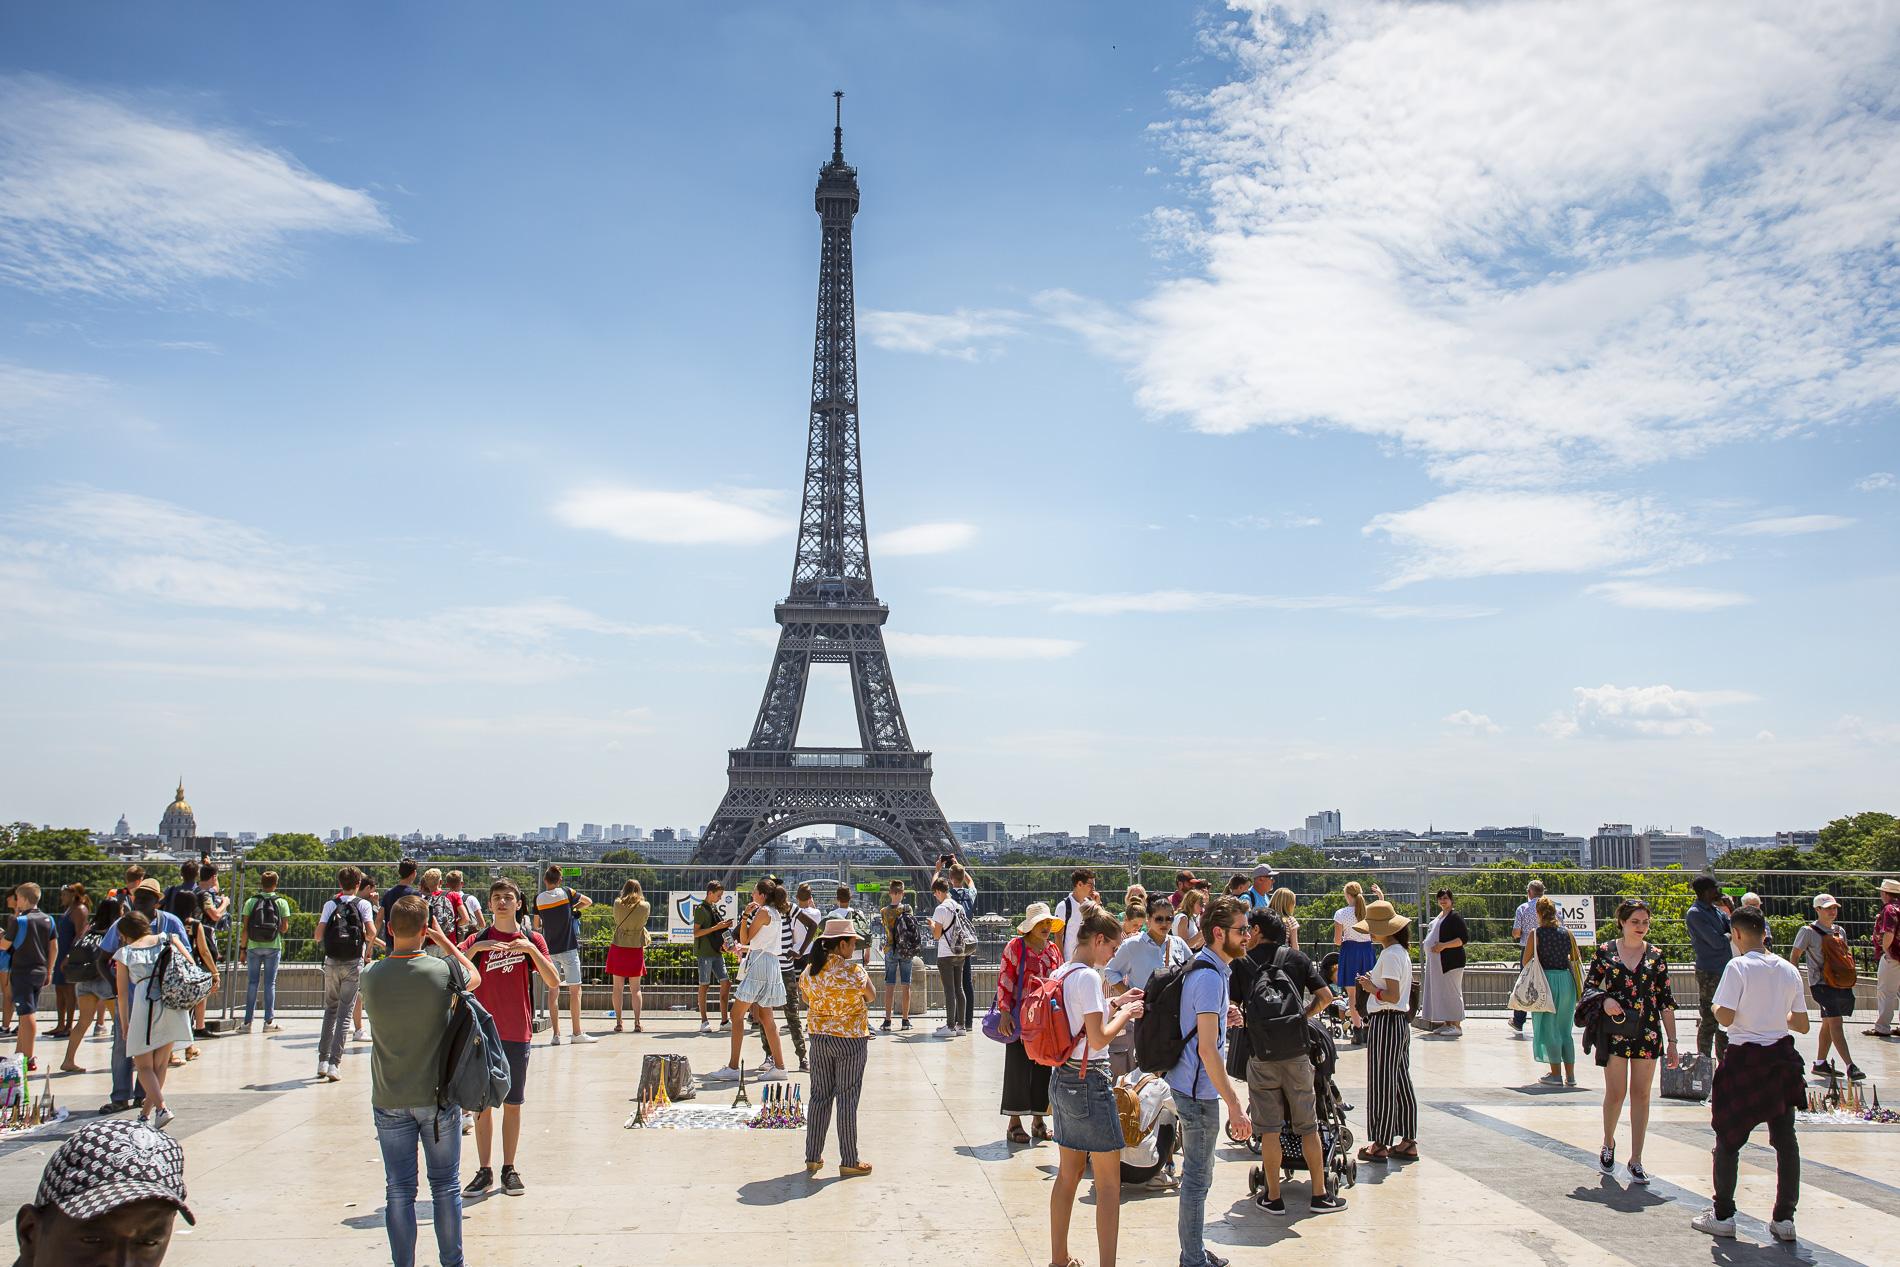 Imagen típica De la Torre Eiffel con turistas